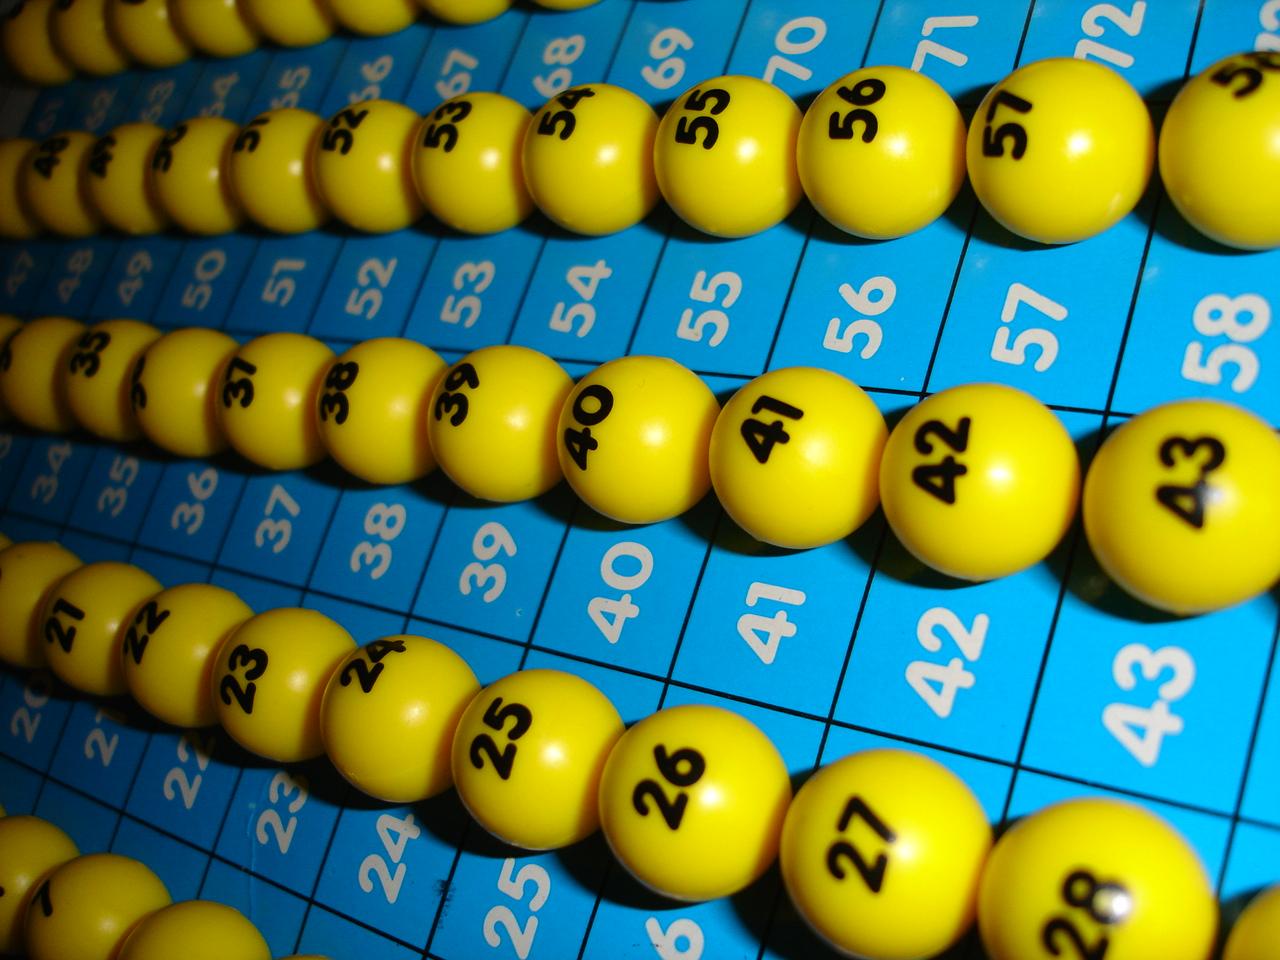 William Hill brings novelty betting to bingo